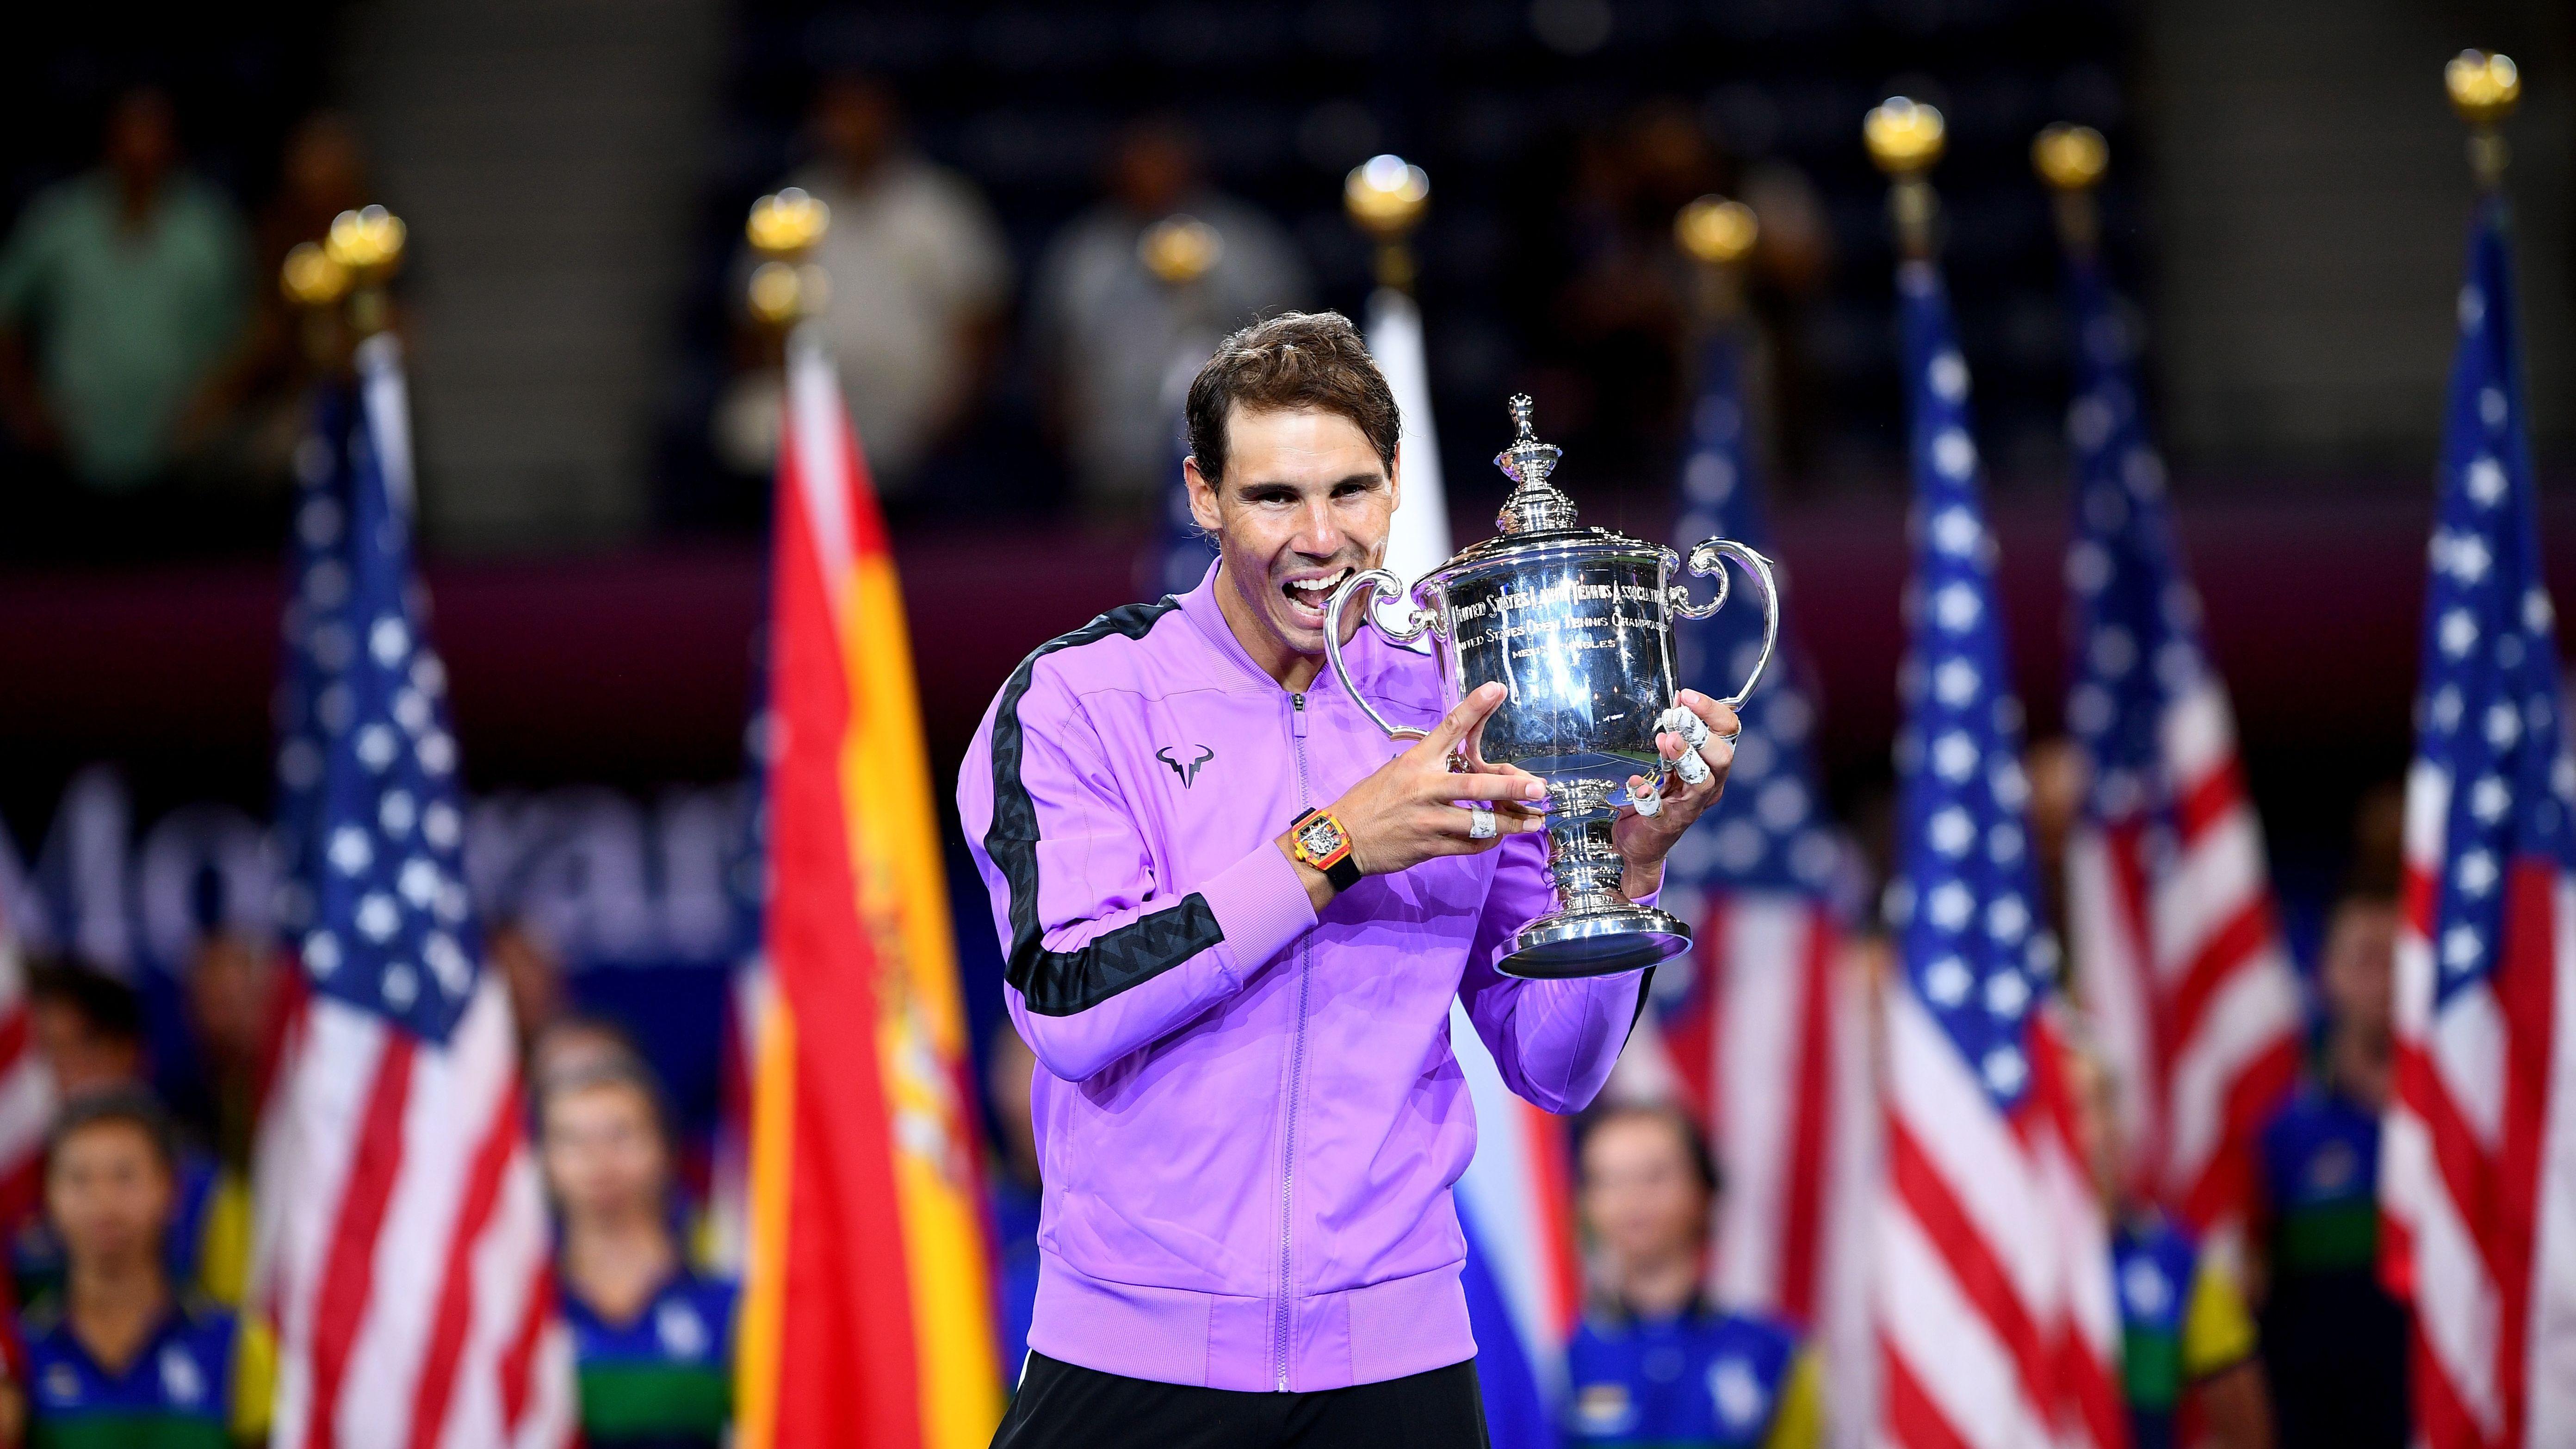 Nadal Defies Inspired Medvedev in Five-Set Epic to Win US Open